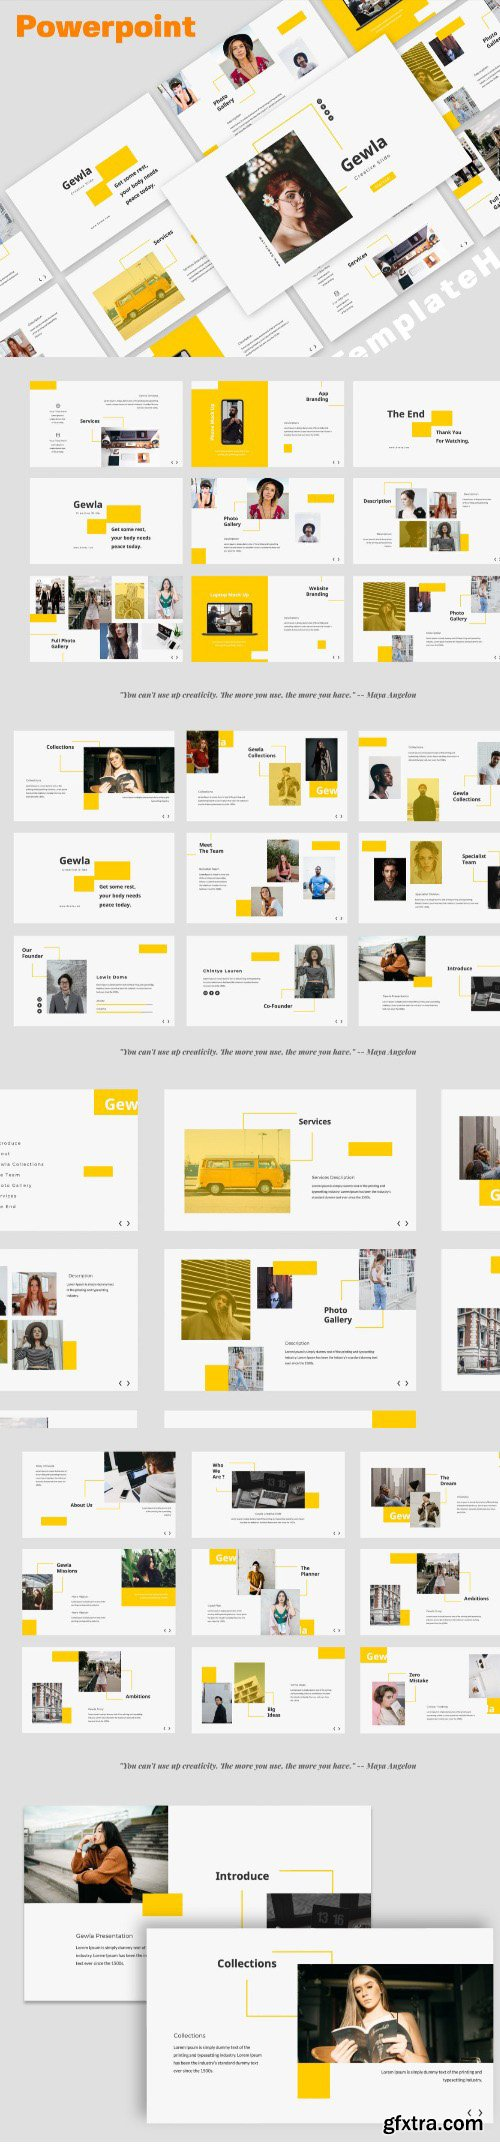 Gewla Creative Powerpoint, Keynote and Google Slides Templates